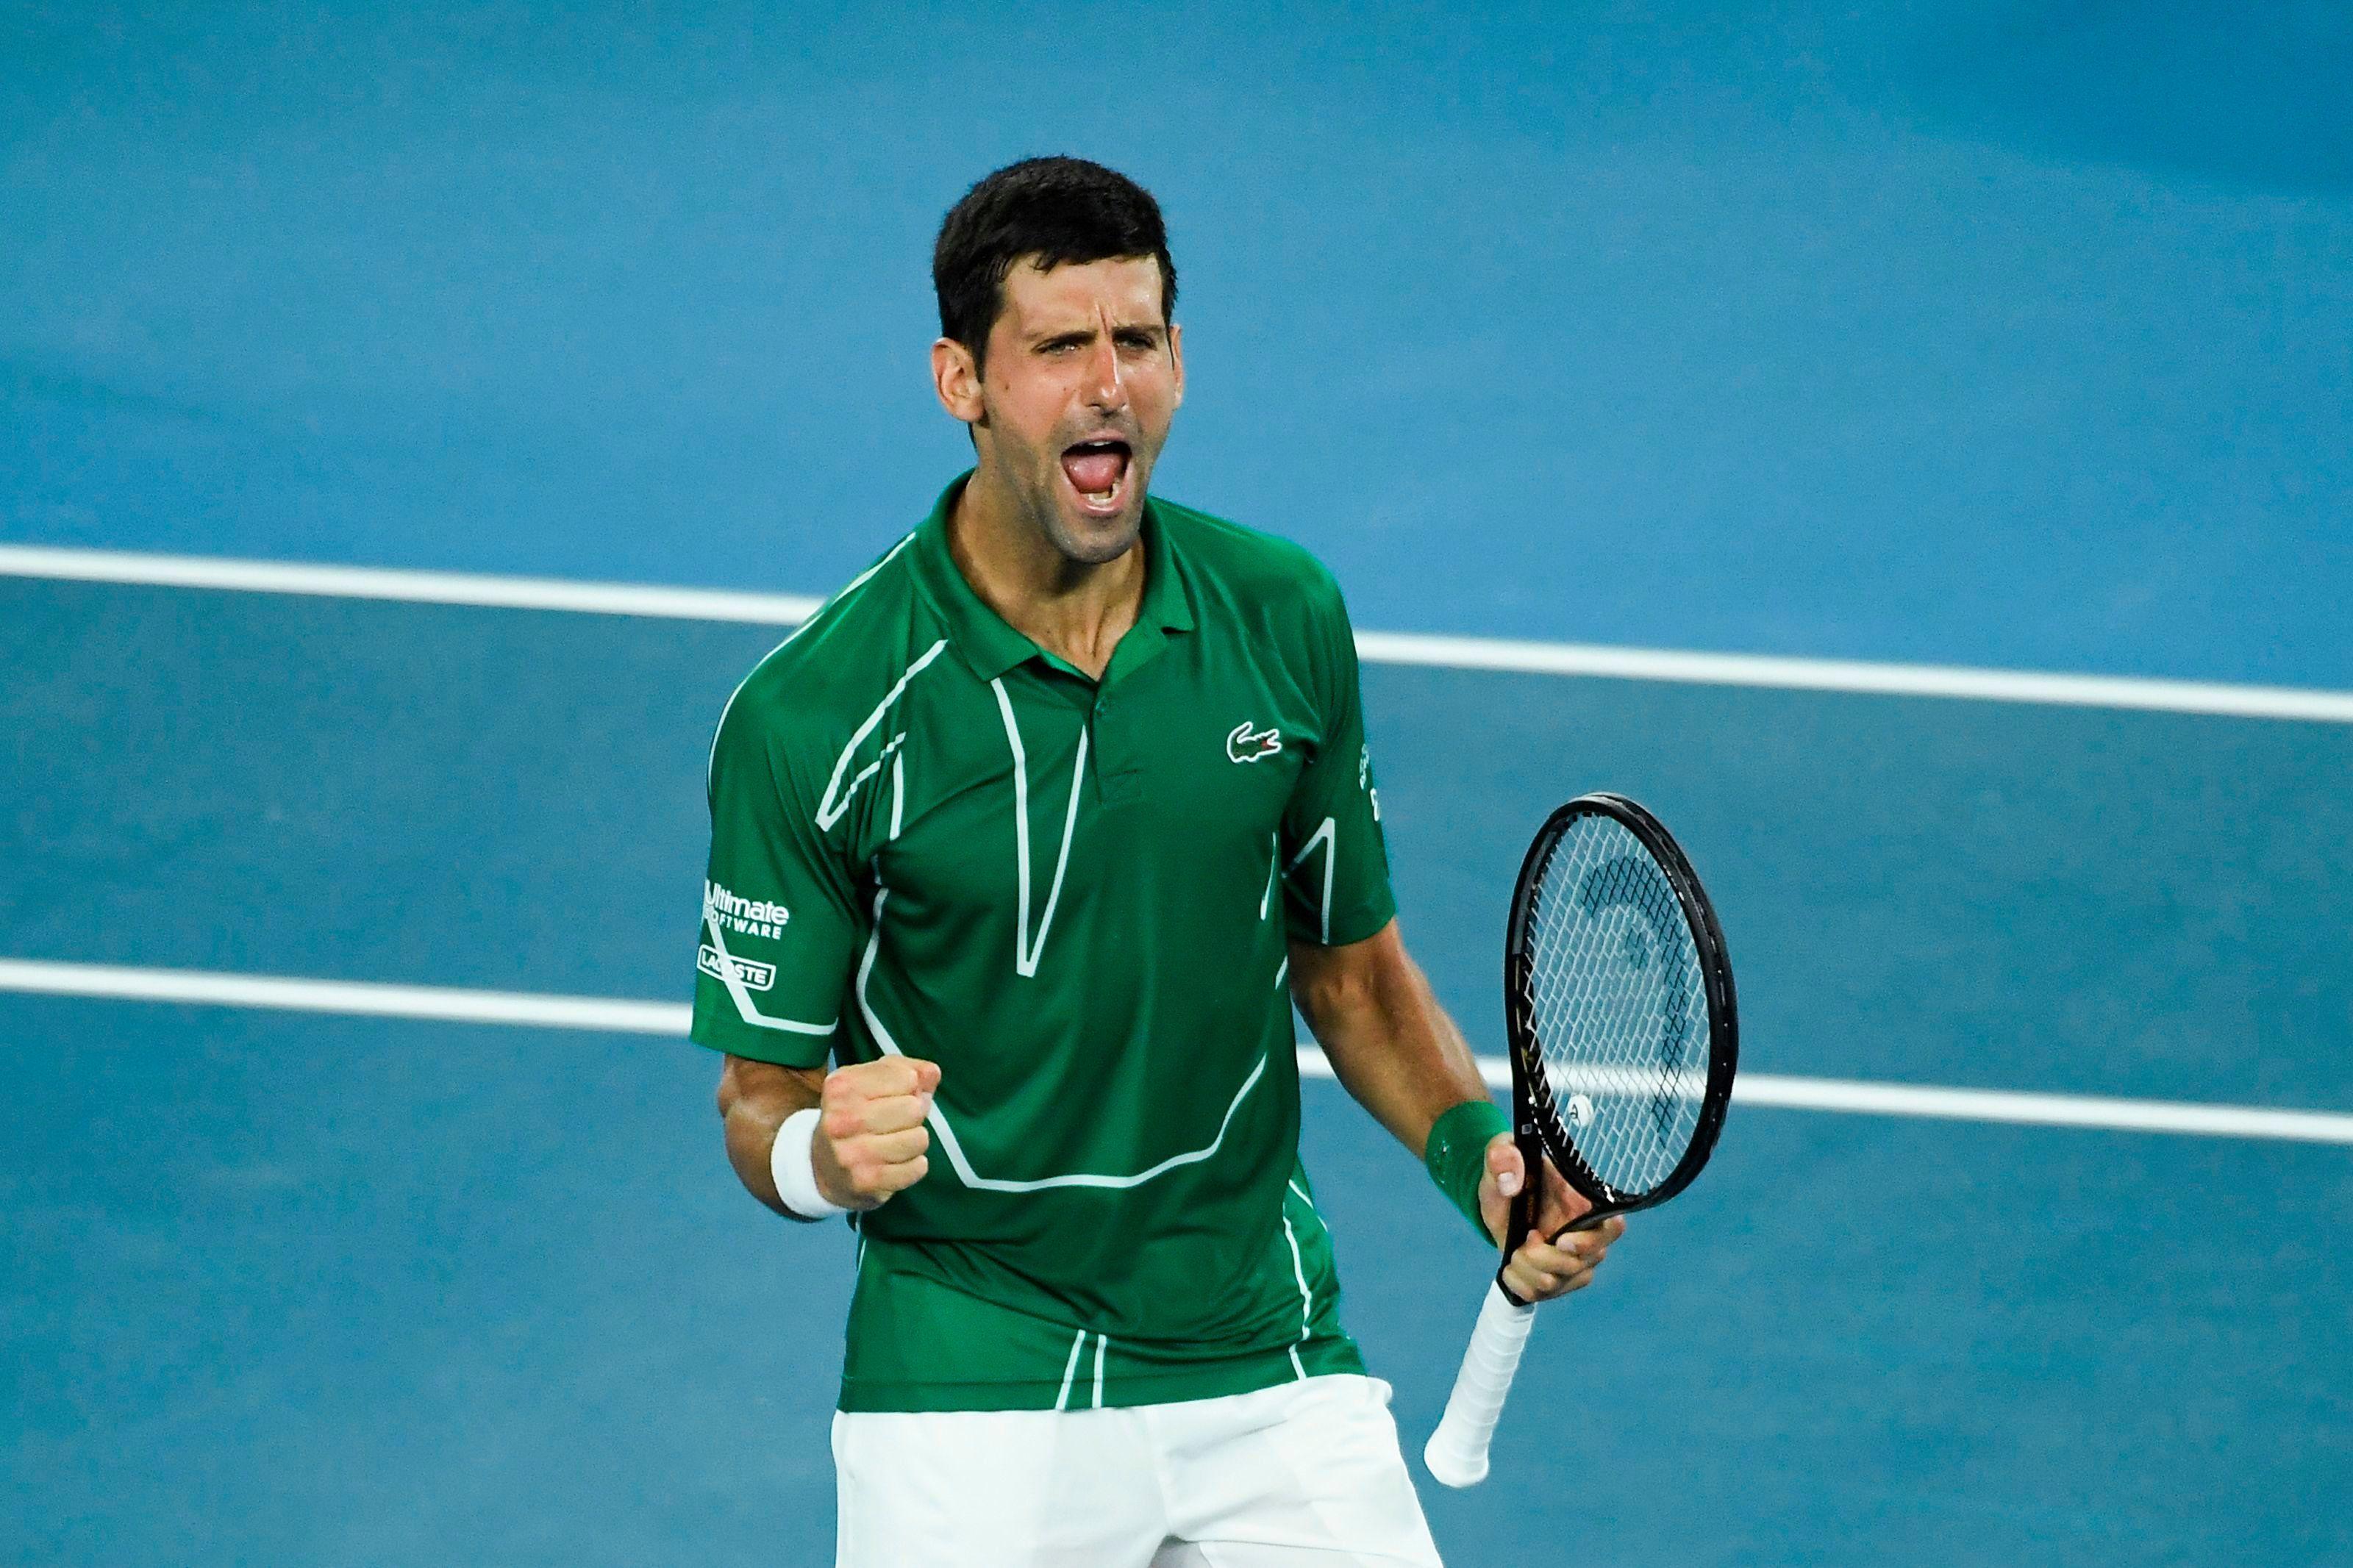 Novak Djokovic Outlasts Roger Federer To Stay Dominant In Australia In 2020 Novak Djokovic Roger Federer Wimbledon Final